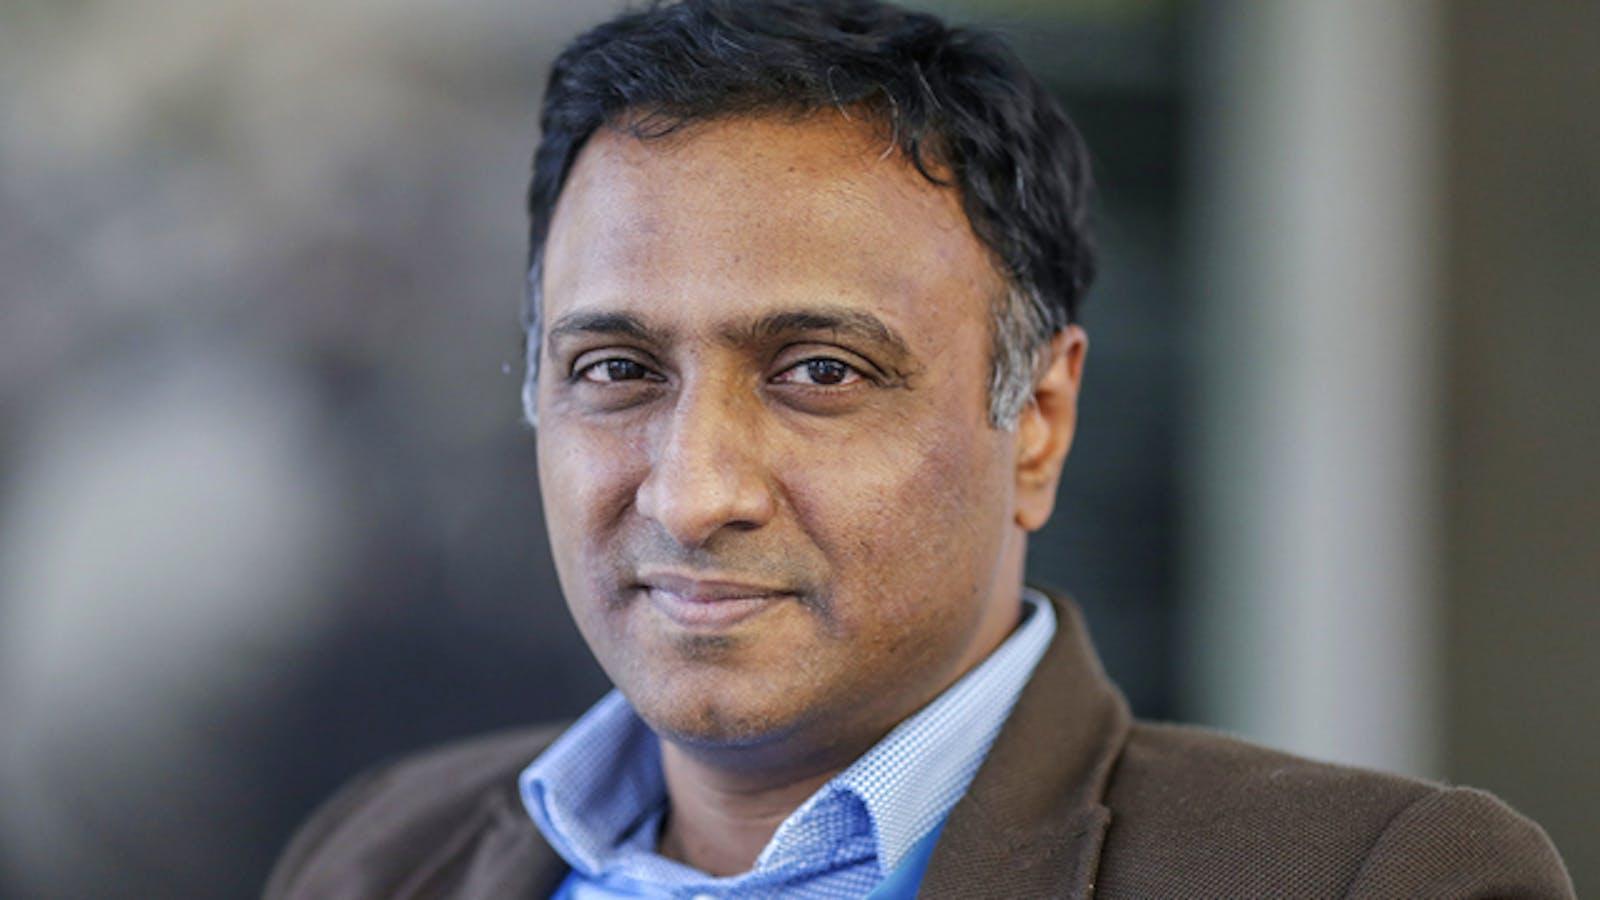 Flipkart CEO Kalyan Krishnamurthy. Photo by Bloomberg.